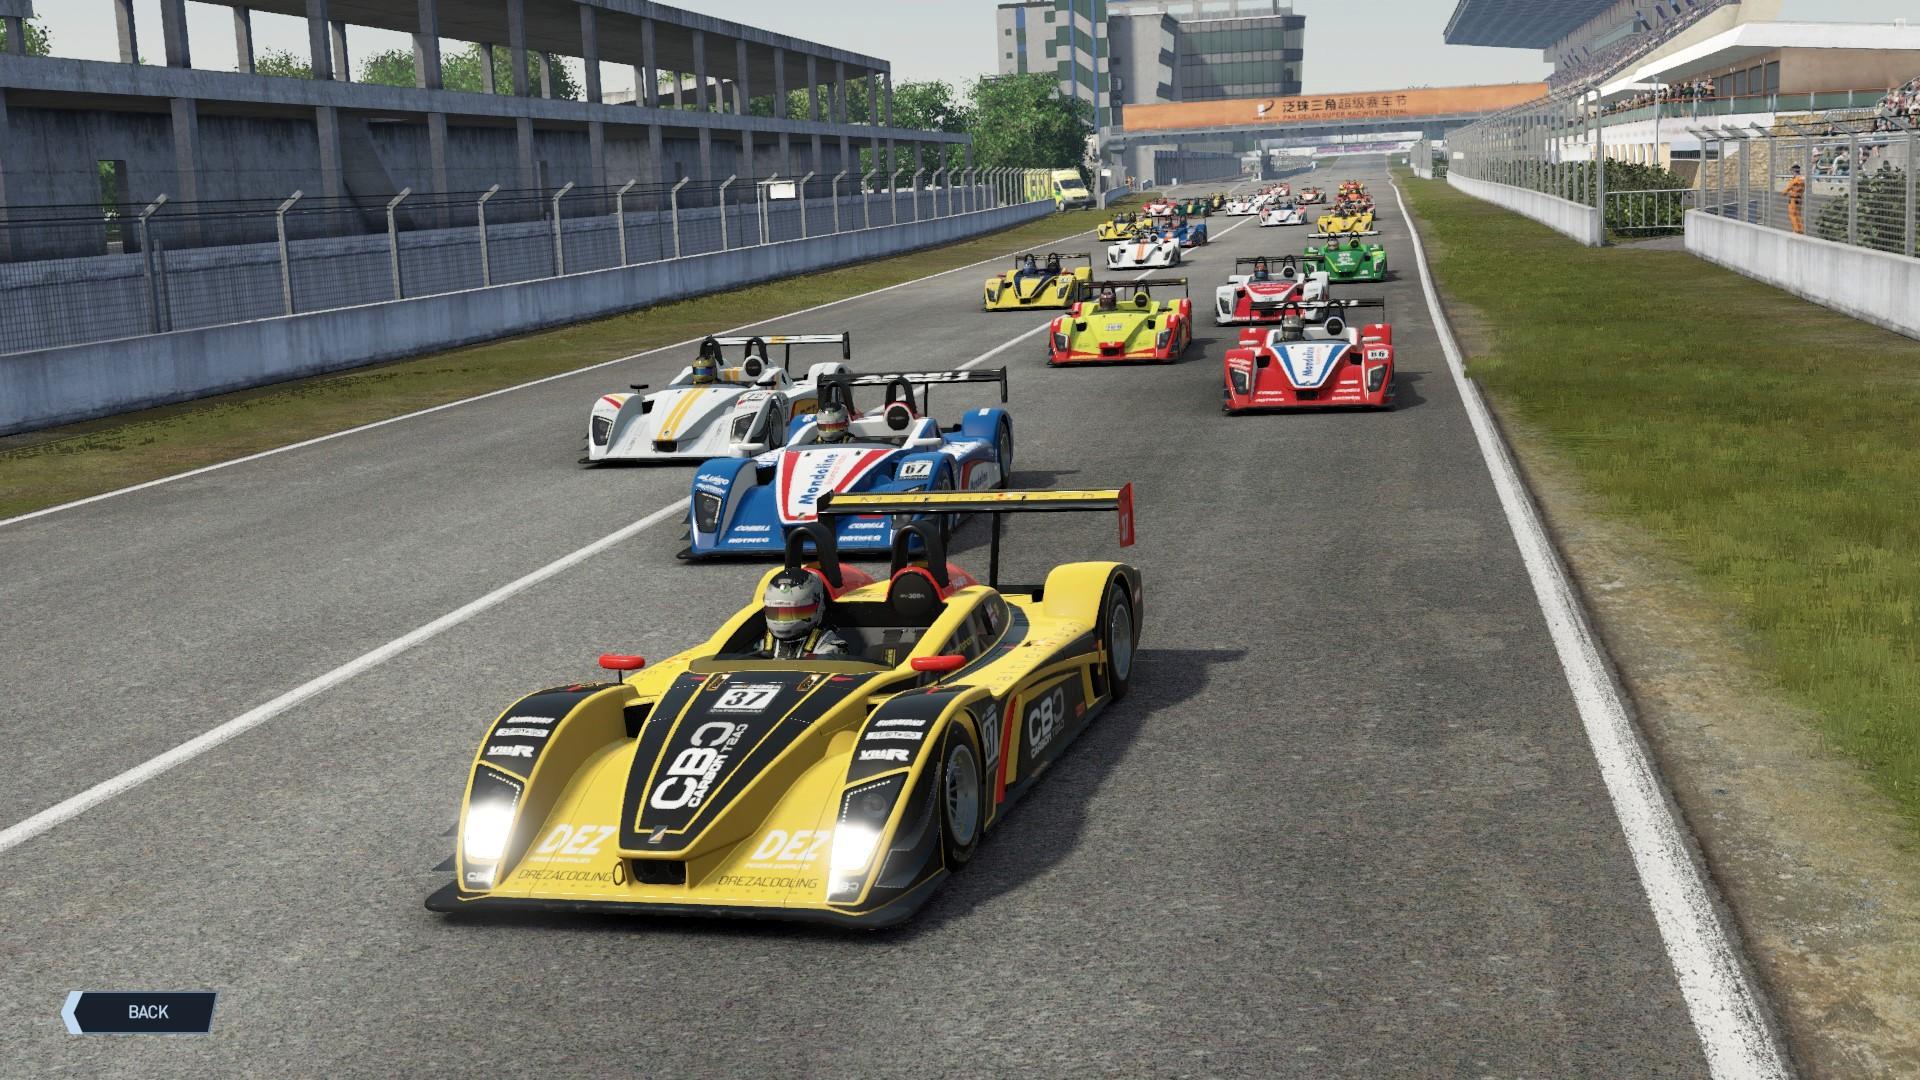 Project Cars 2 -Caterham Bajnokság